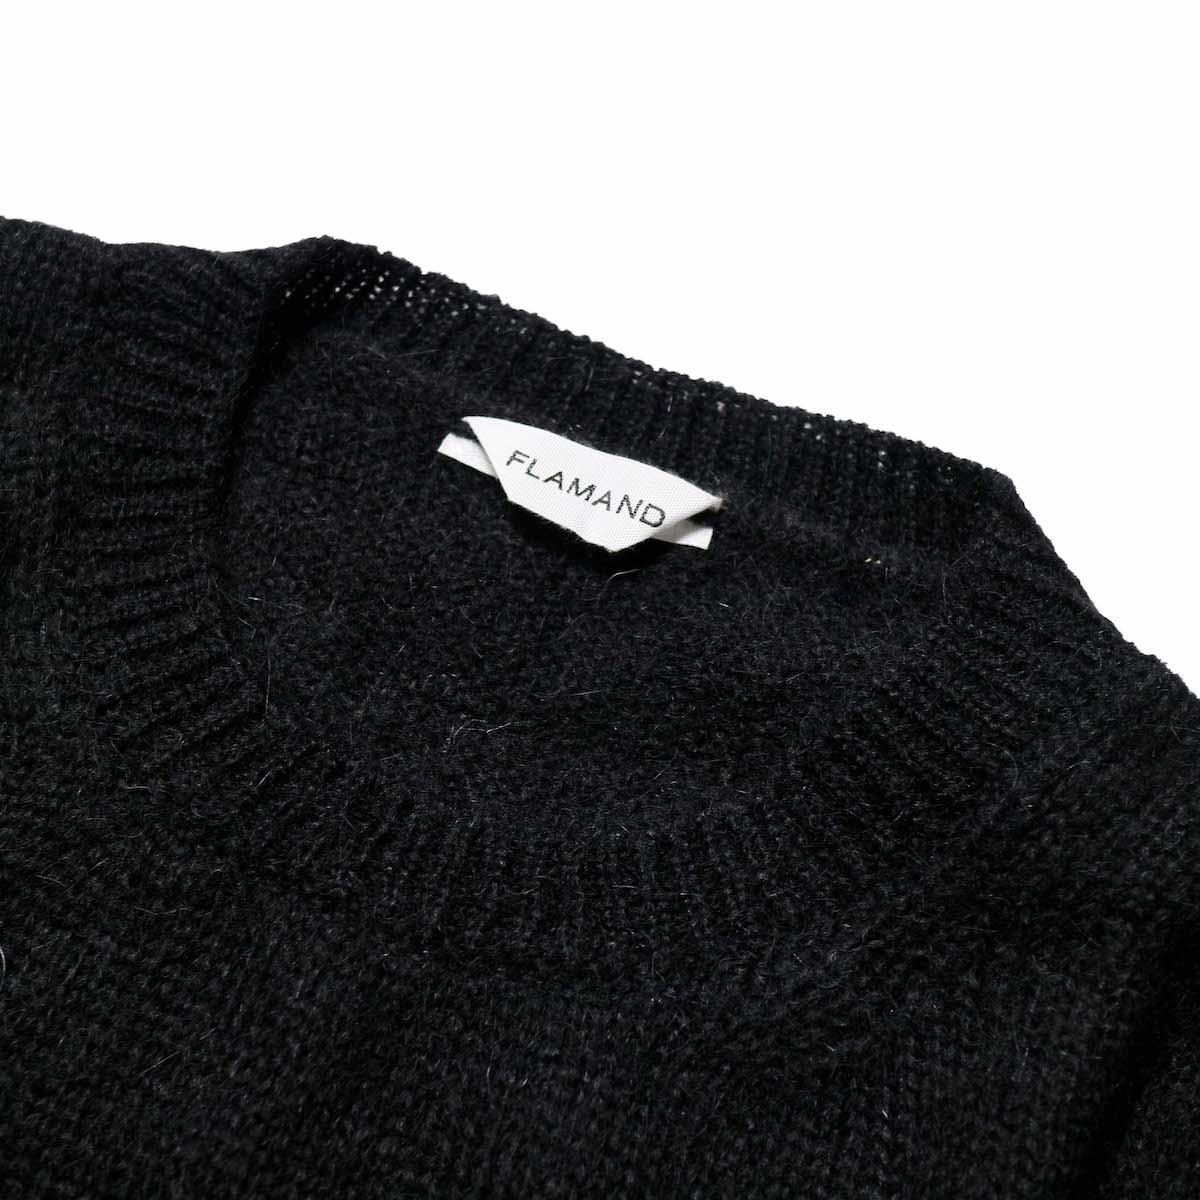 FLAMAND / Mohair Basic (Black)クルーネック